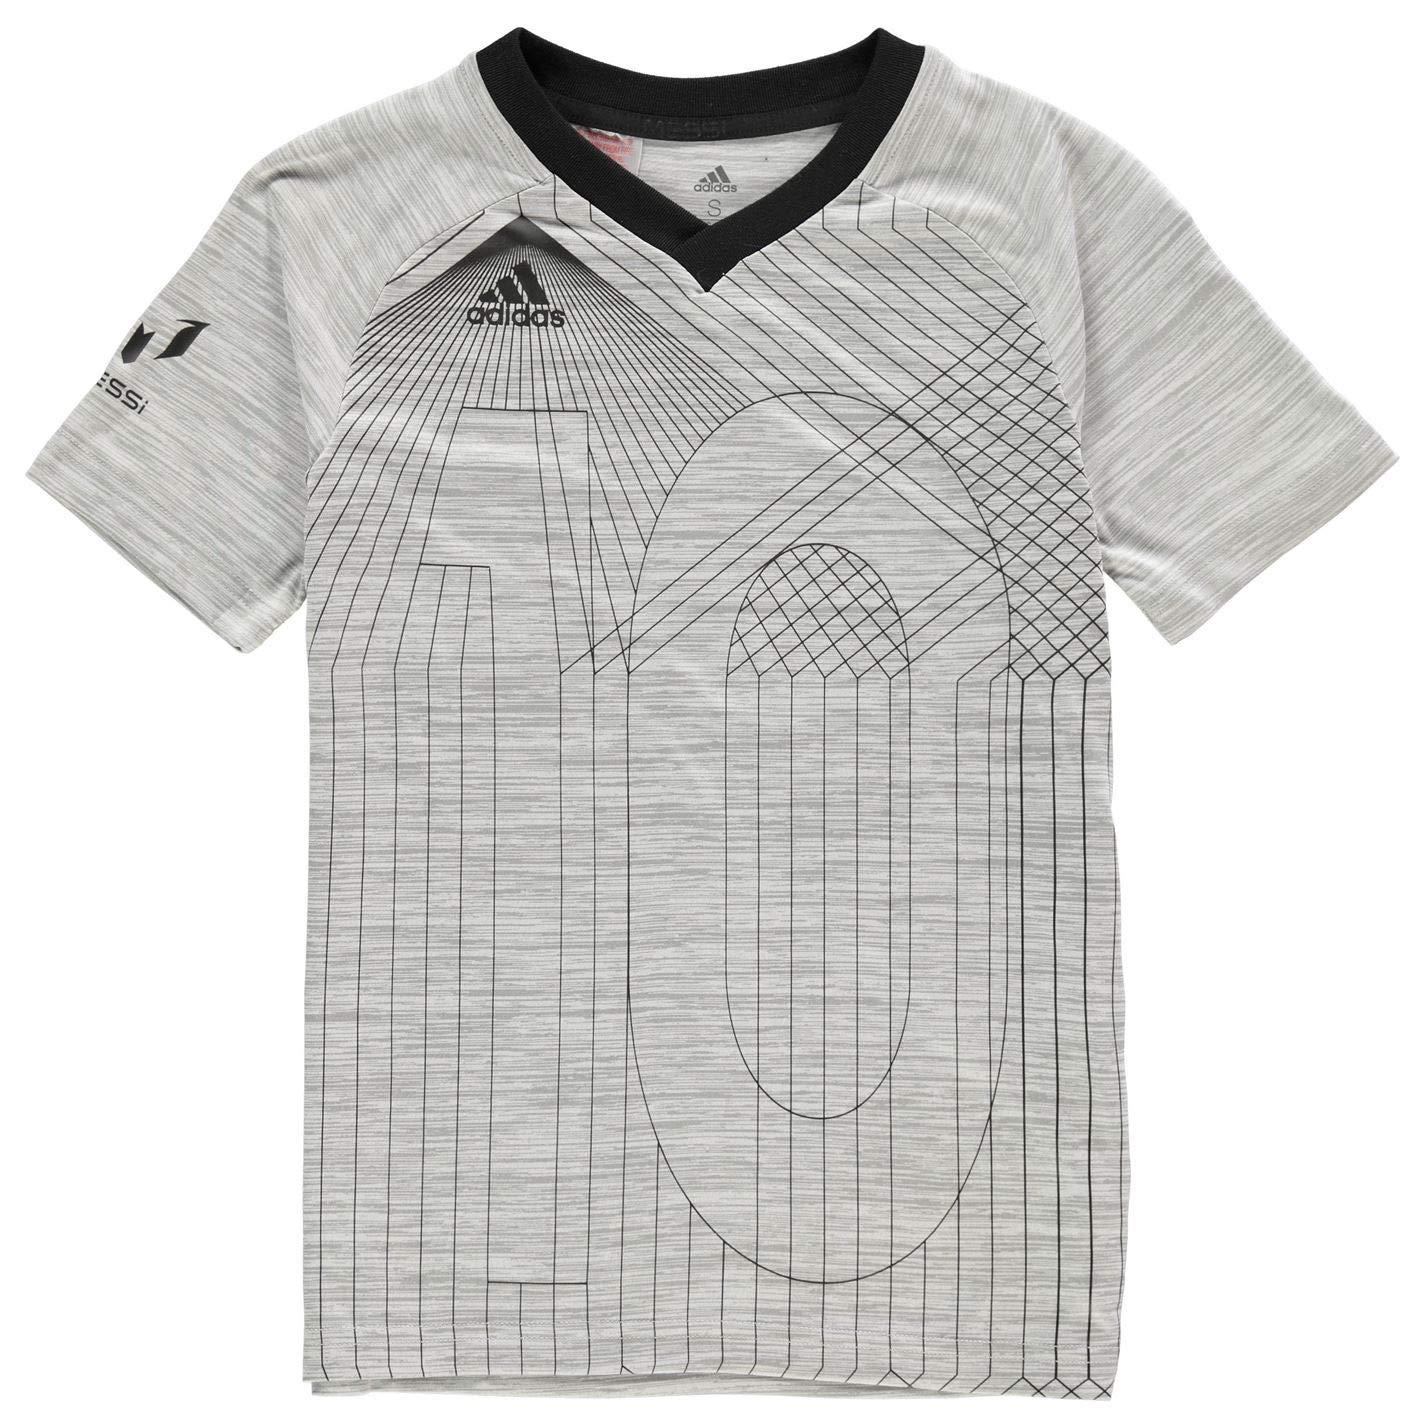 adidas Boys 'T-Shirt Short Sleeve Top, Boys', DJ1294 Boys'